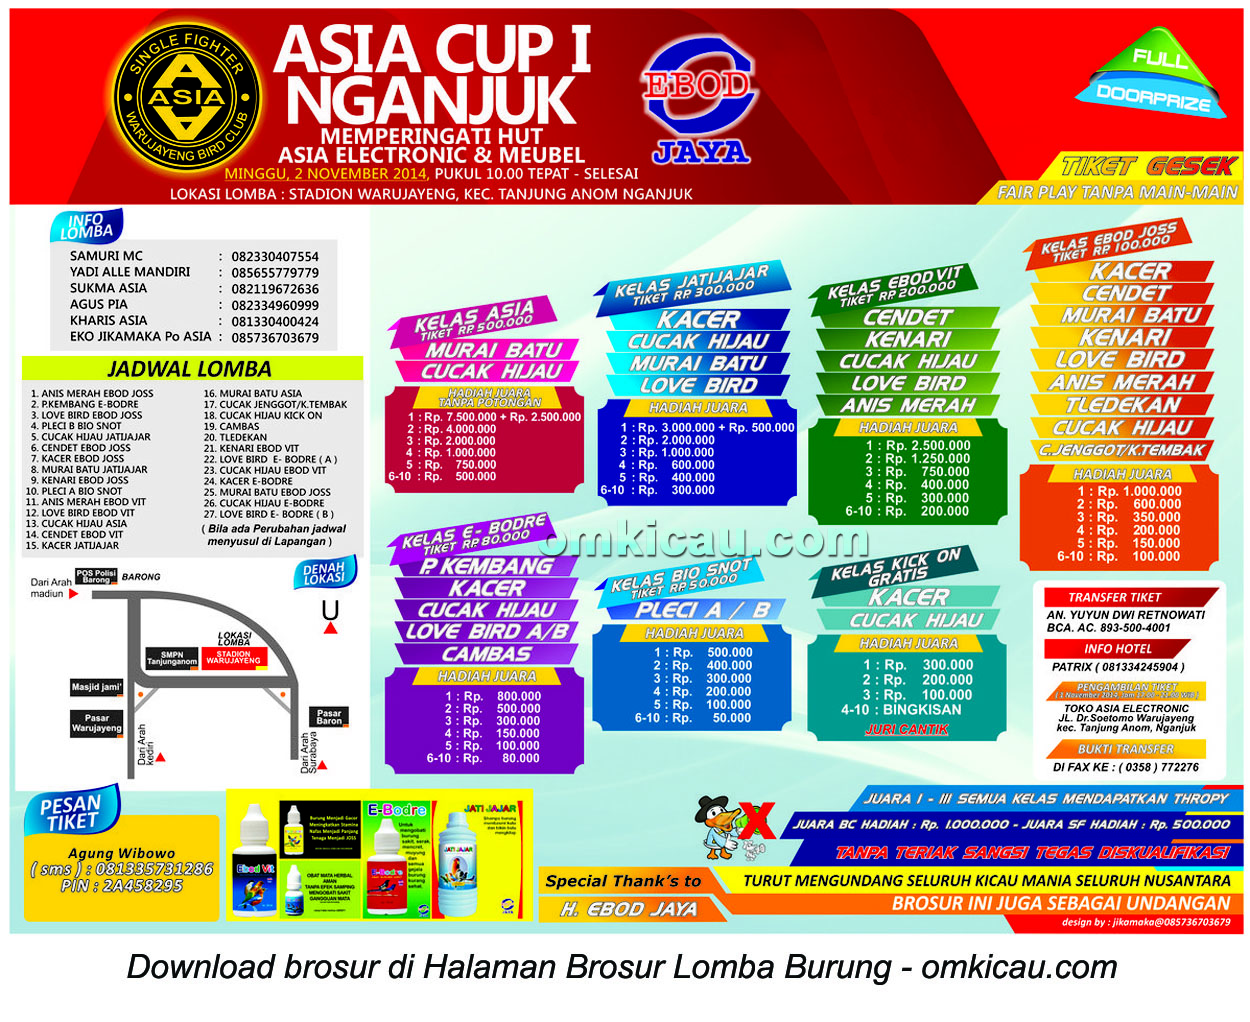 Brosur Lomba Burung Berkicau Asia Cup I, Nganjuk, 2 November 2014